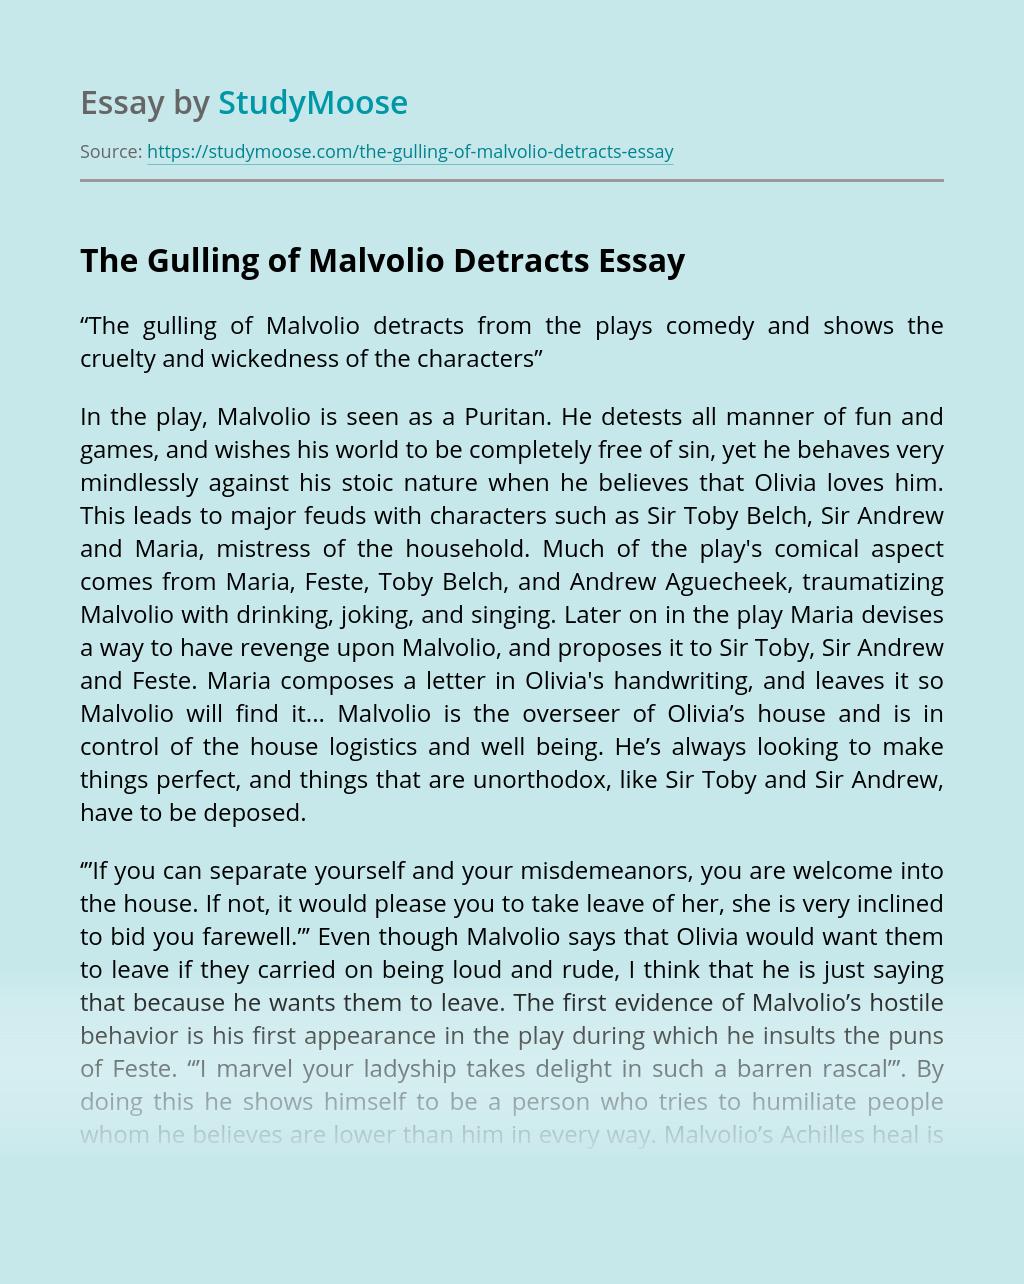 The Gulling of Malvolio Detracts